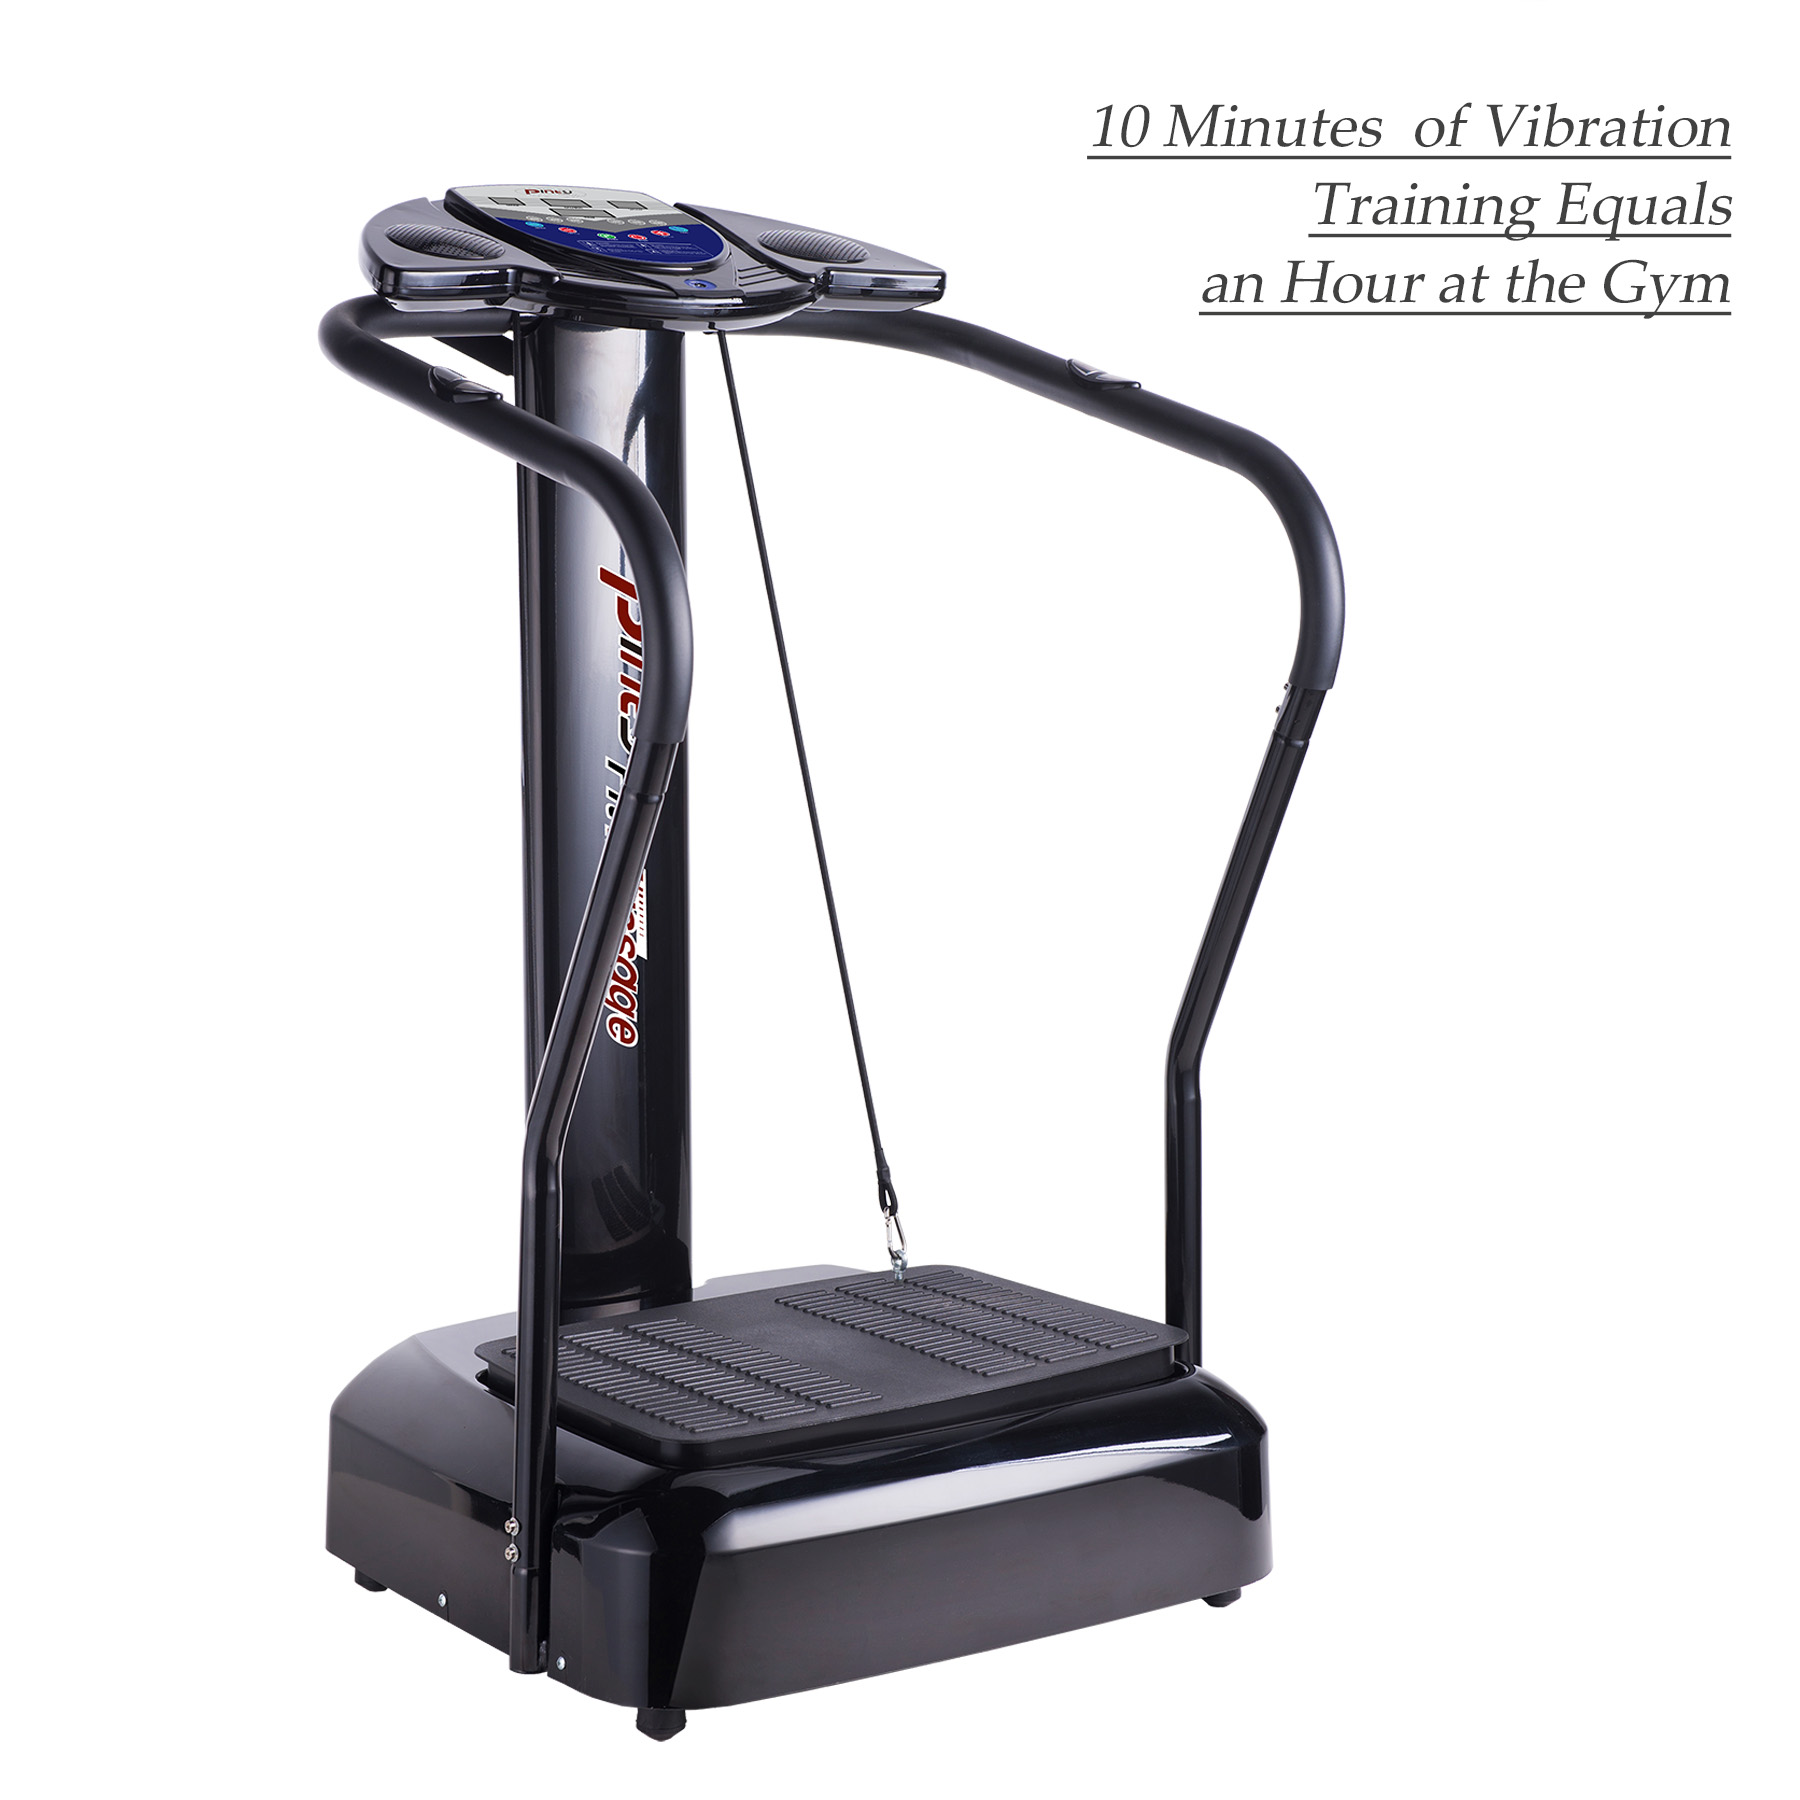 200W Vibrationsplatte platte Vibro platte vibrations trainer shaper Fitnessgerät